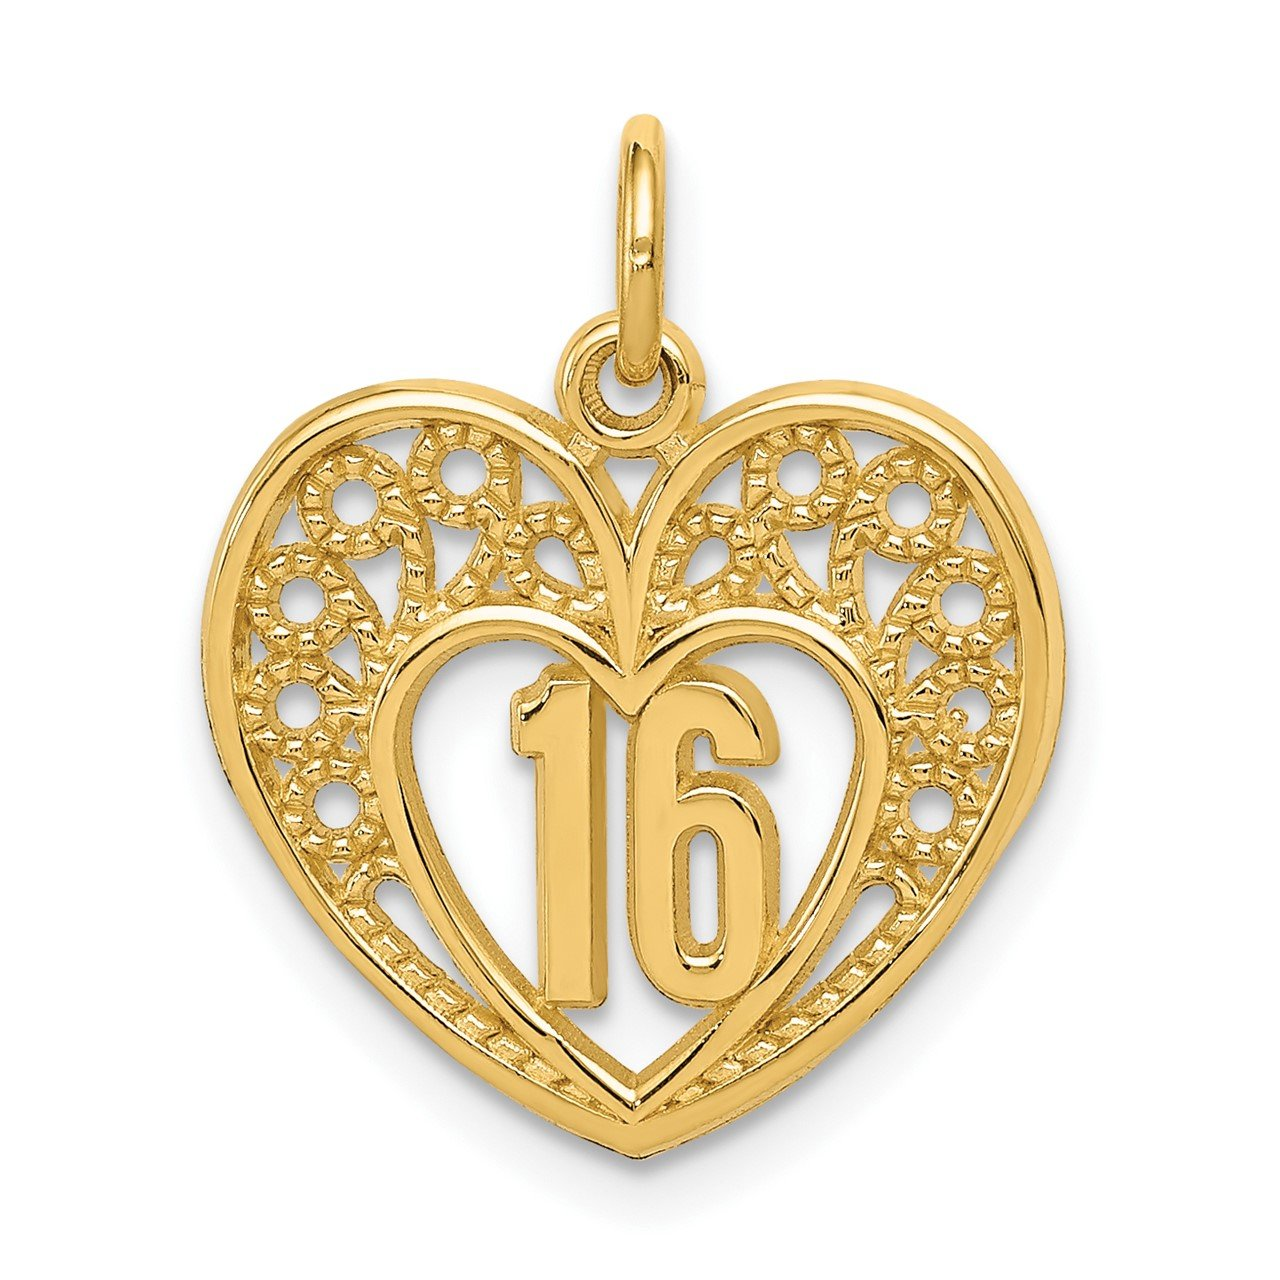 14k 16 Heart Charm